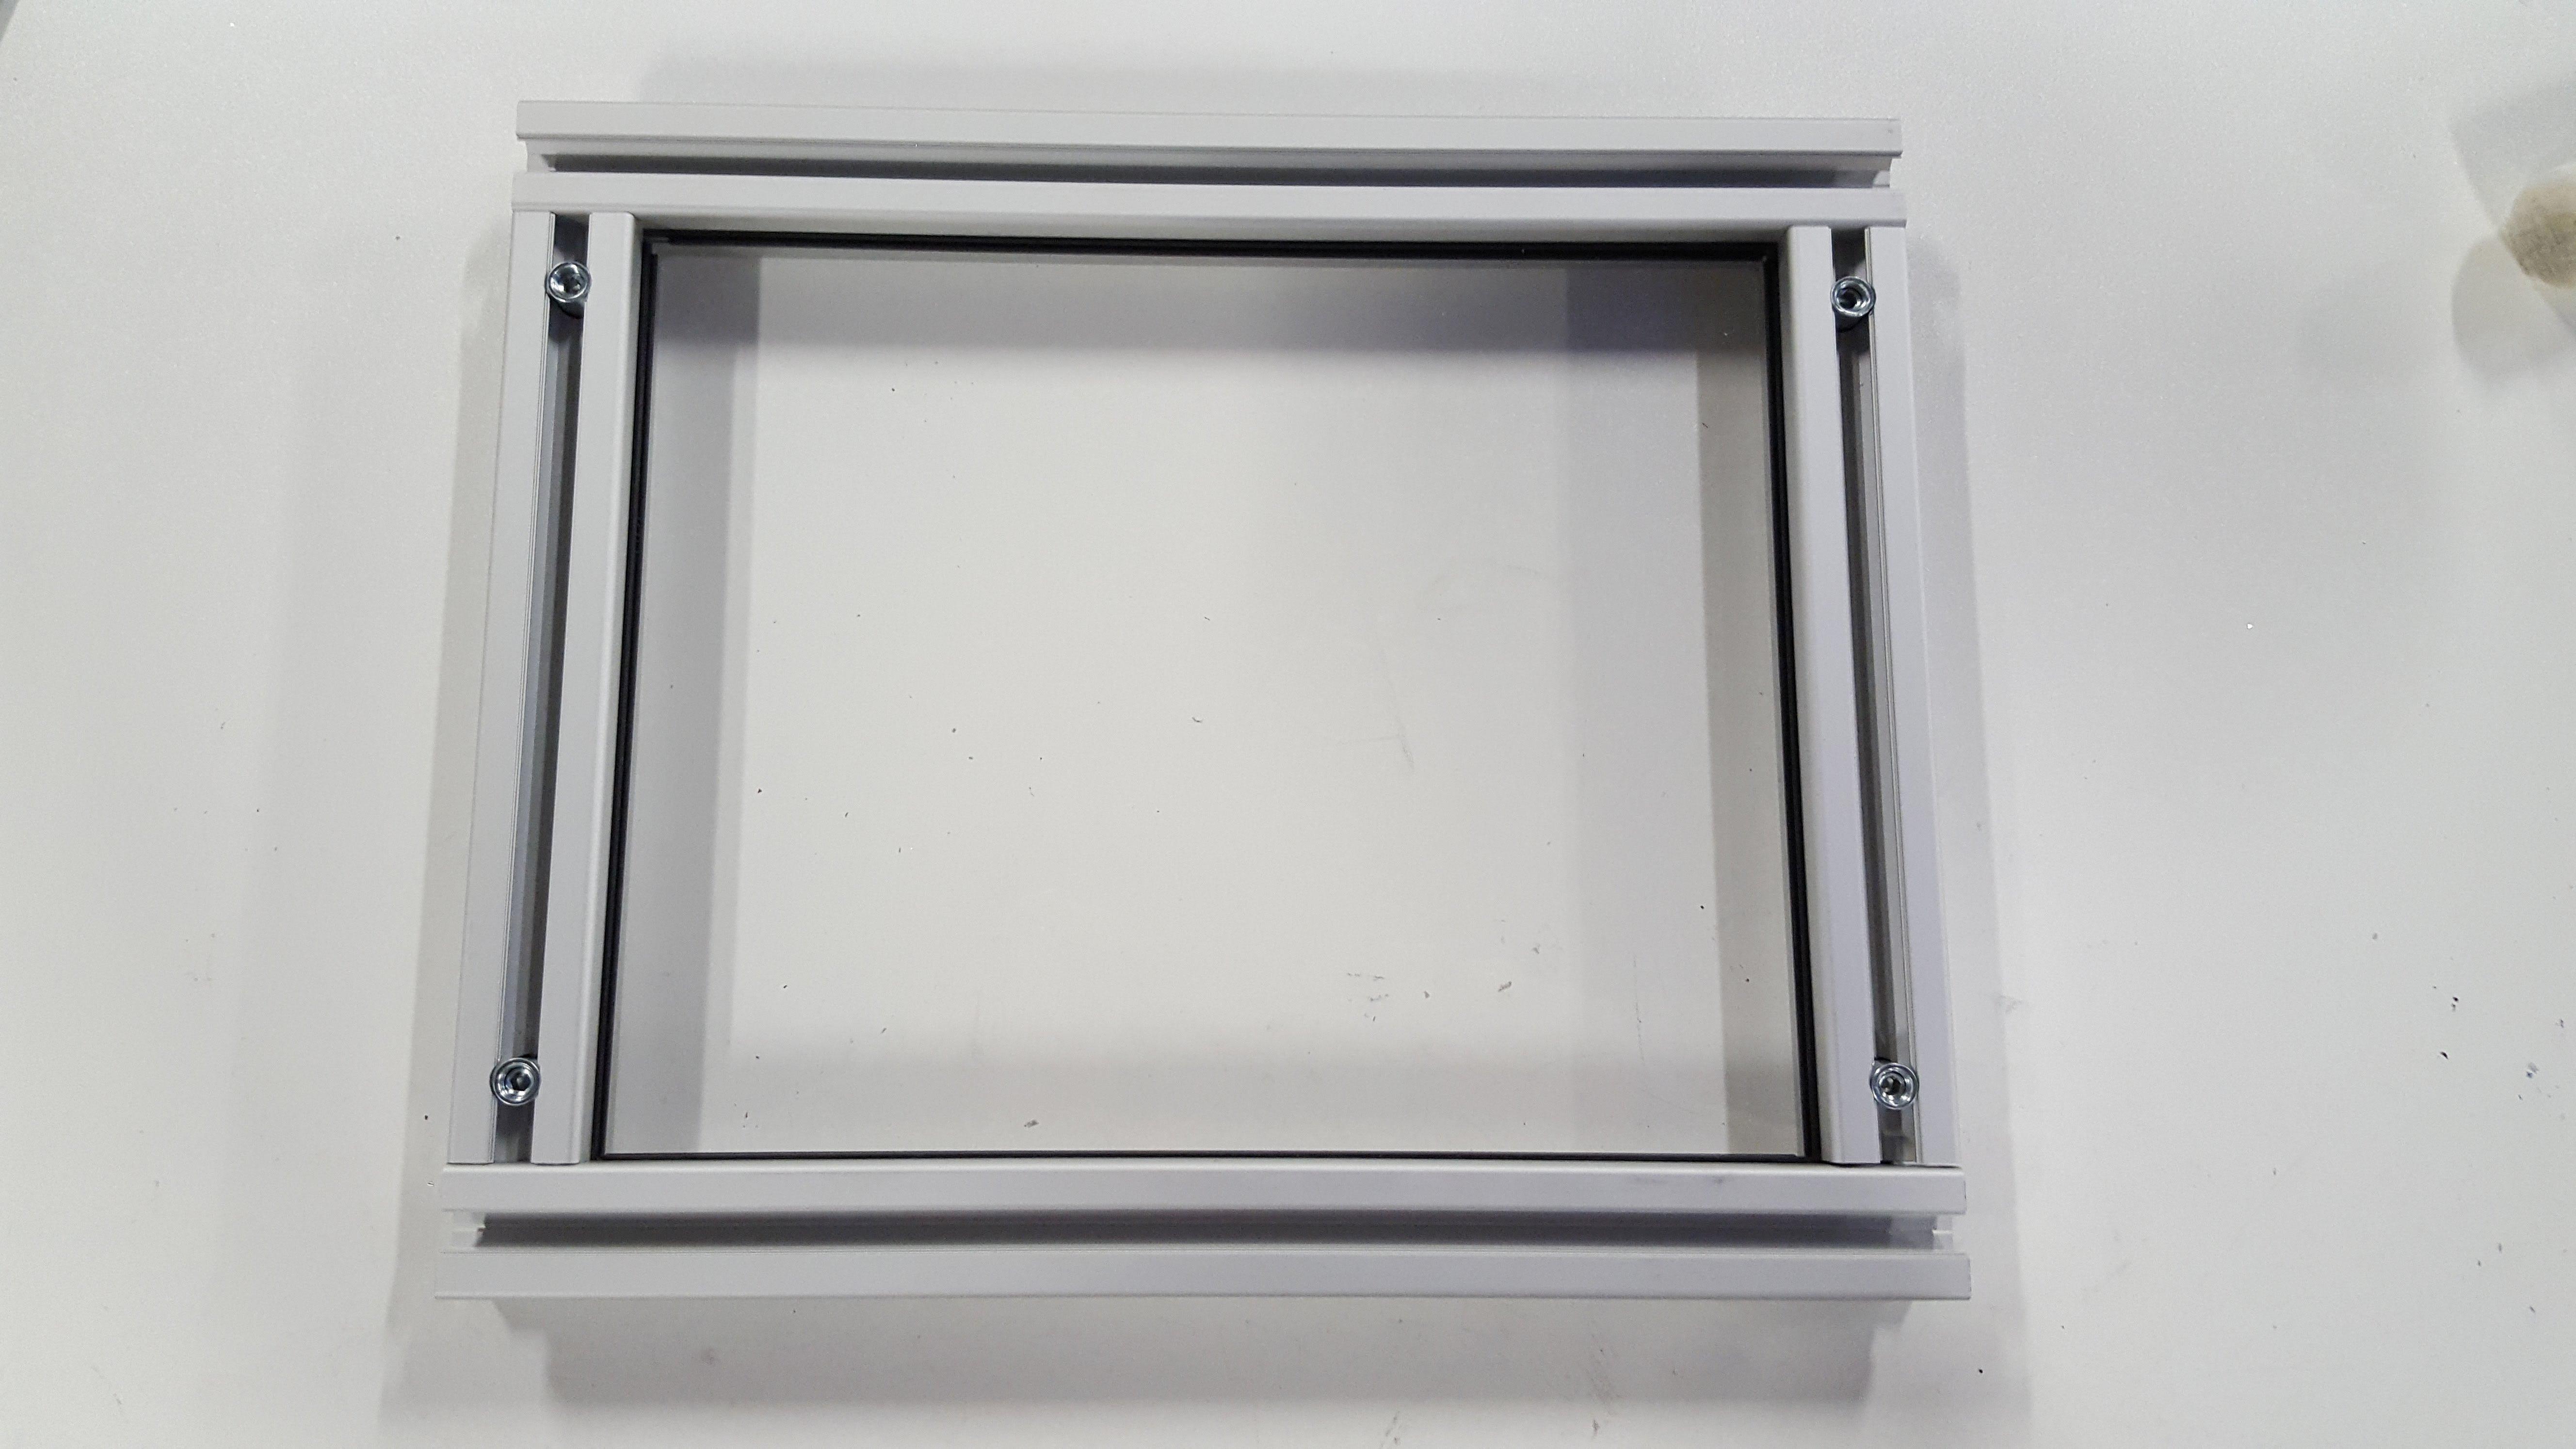 Create a window in modular aluminum profiles - Systéal